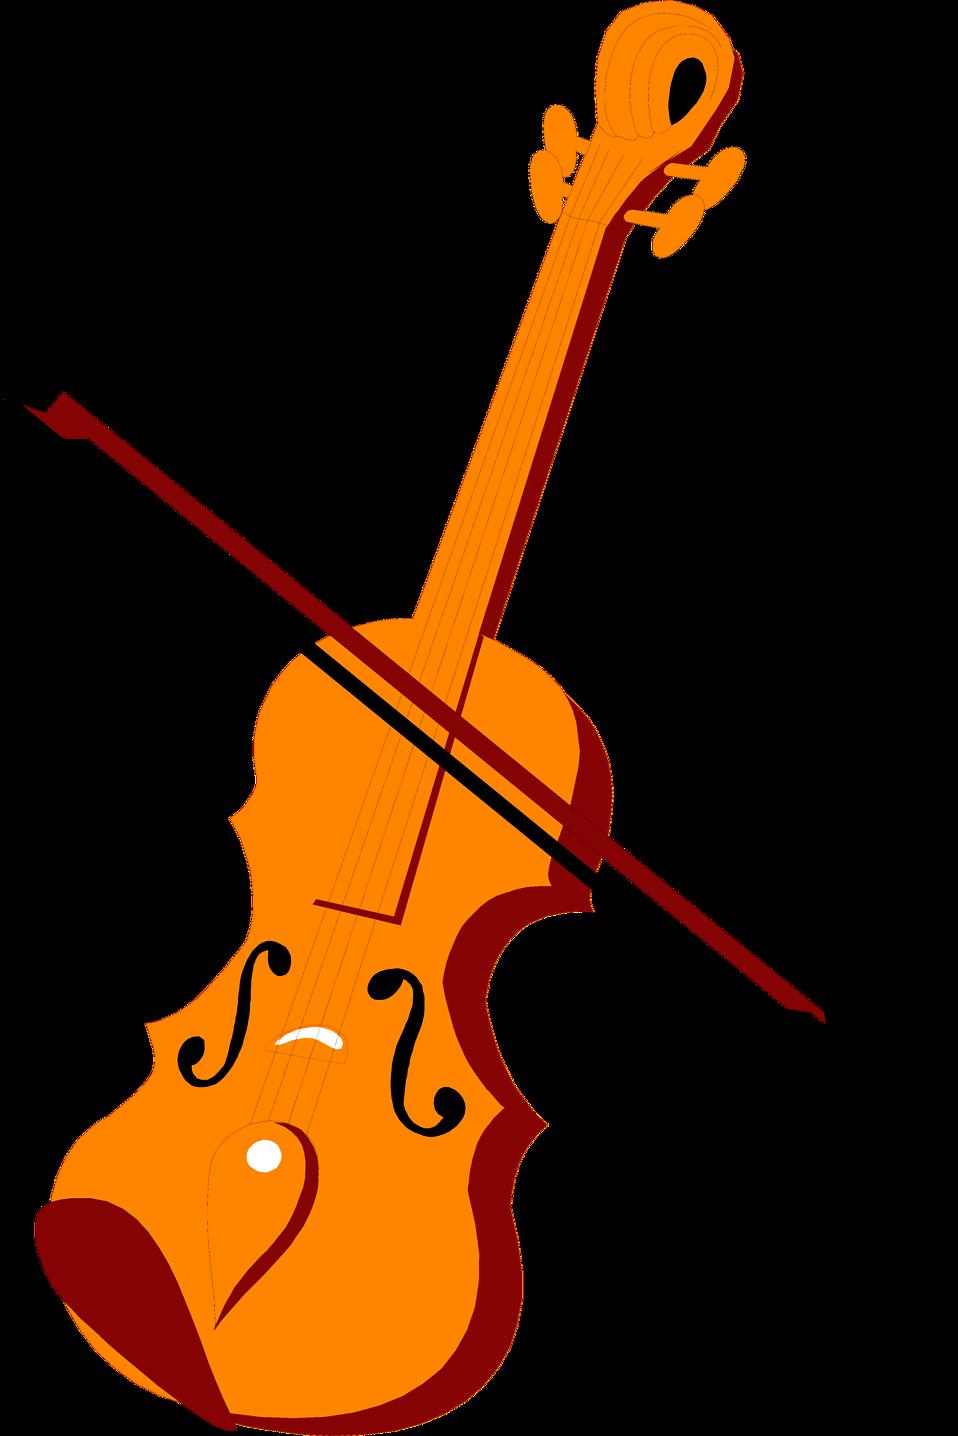 Clip Art Violin Clipart violin bow clipart kid fiddle clip art illustration of a and